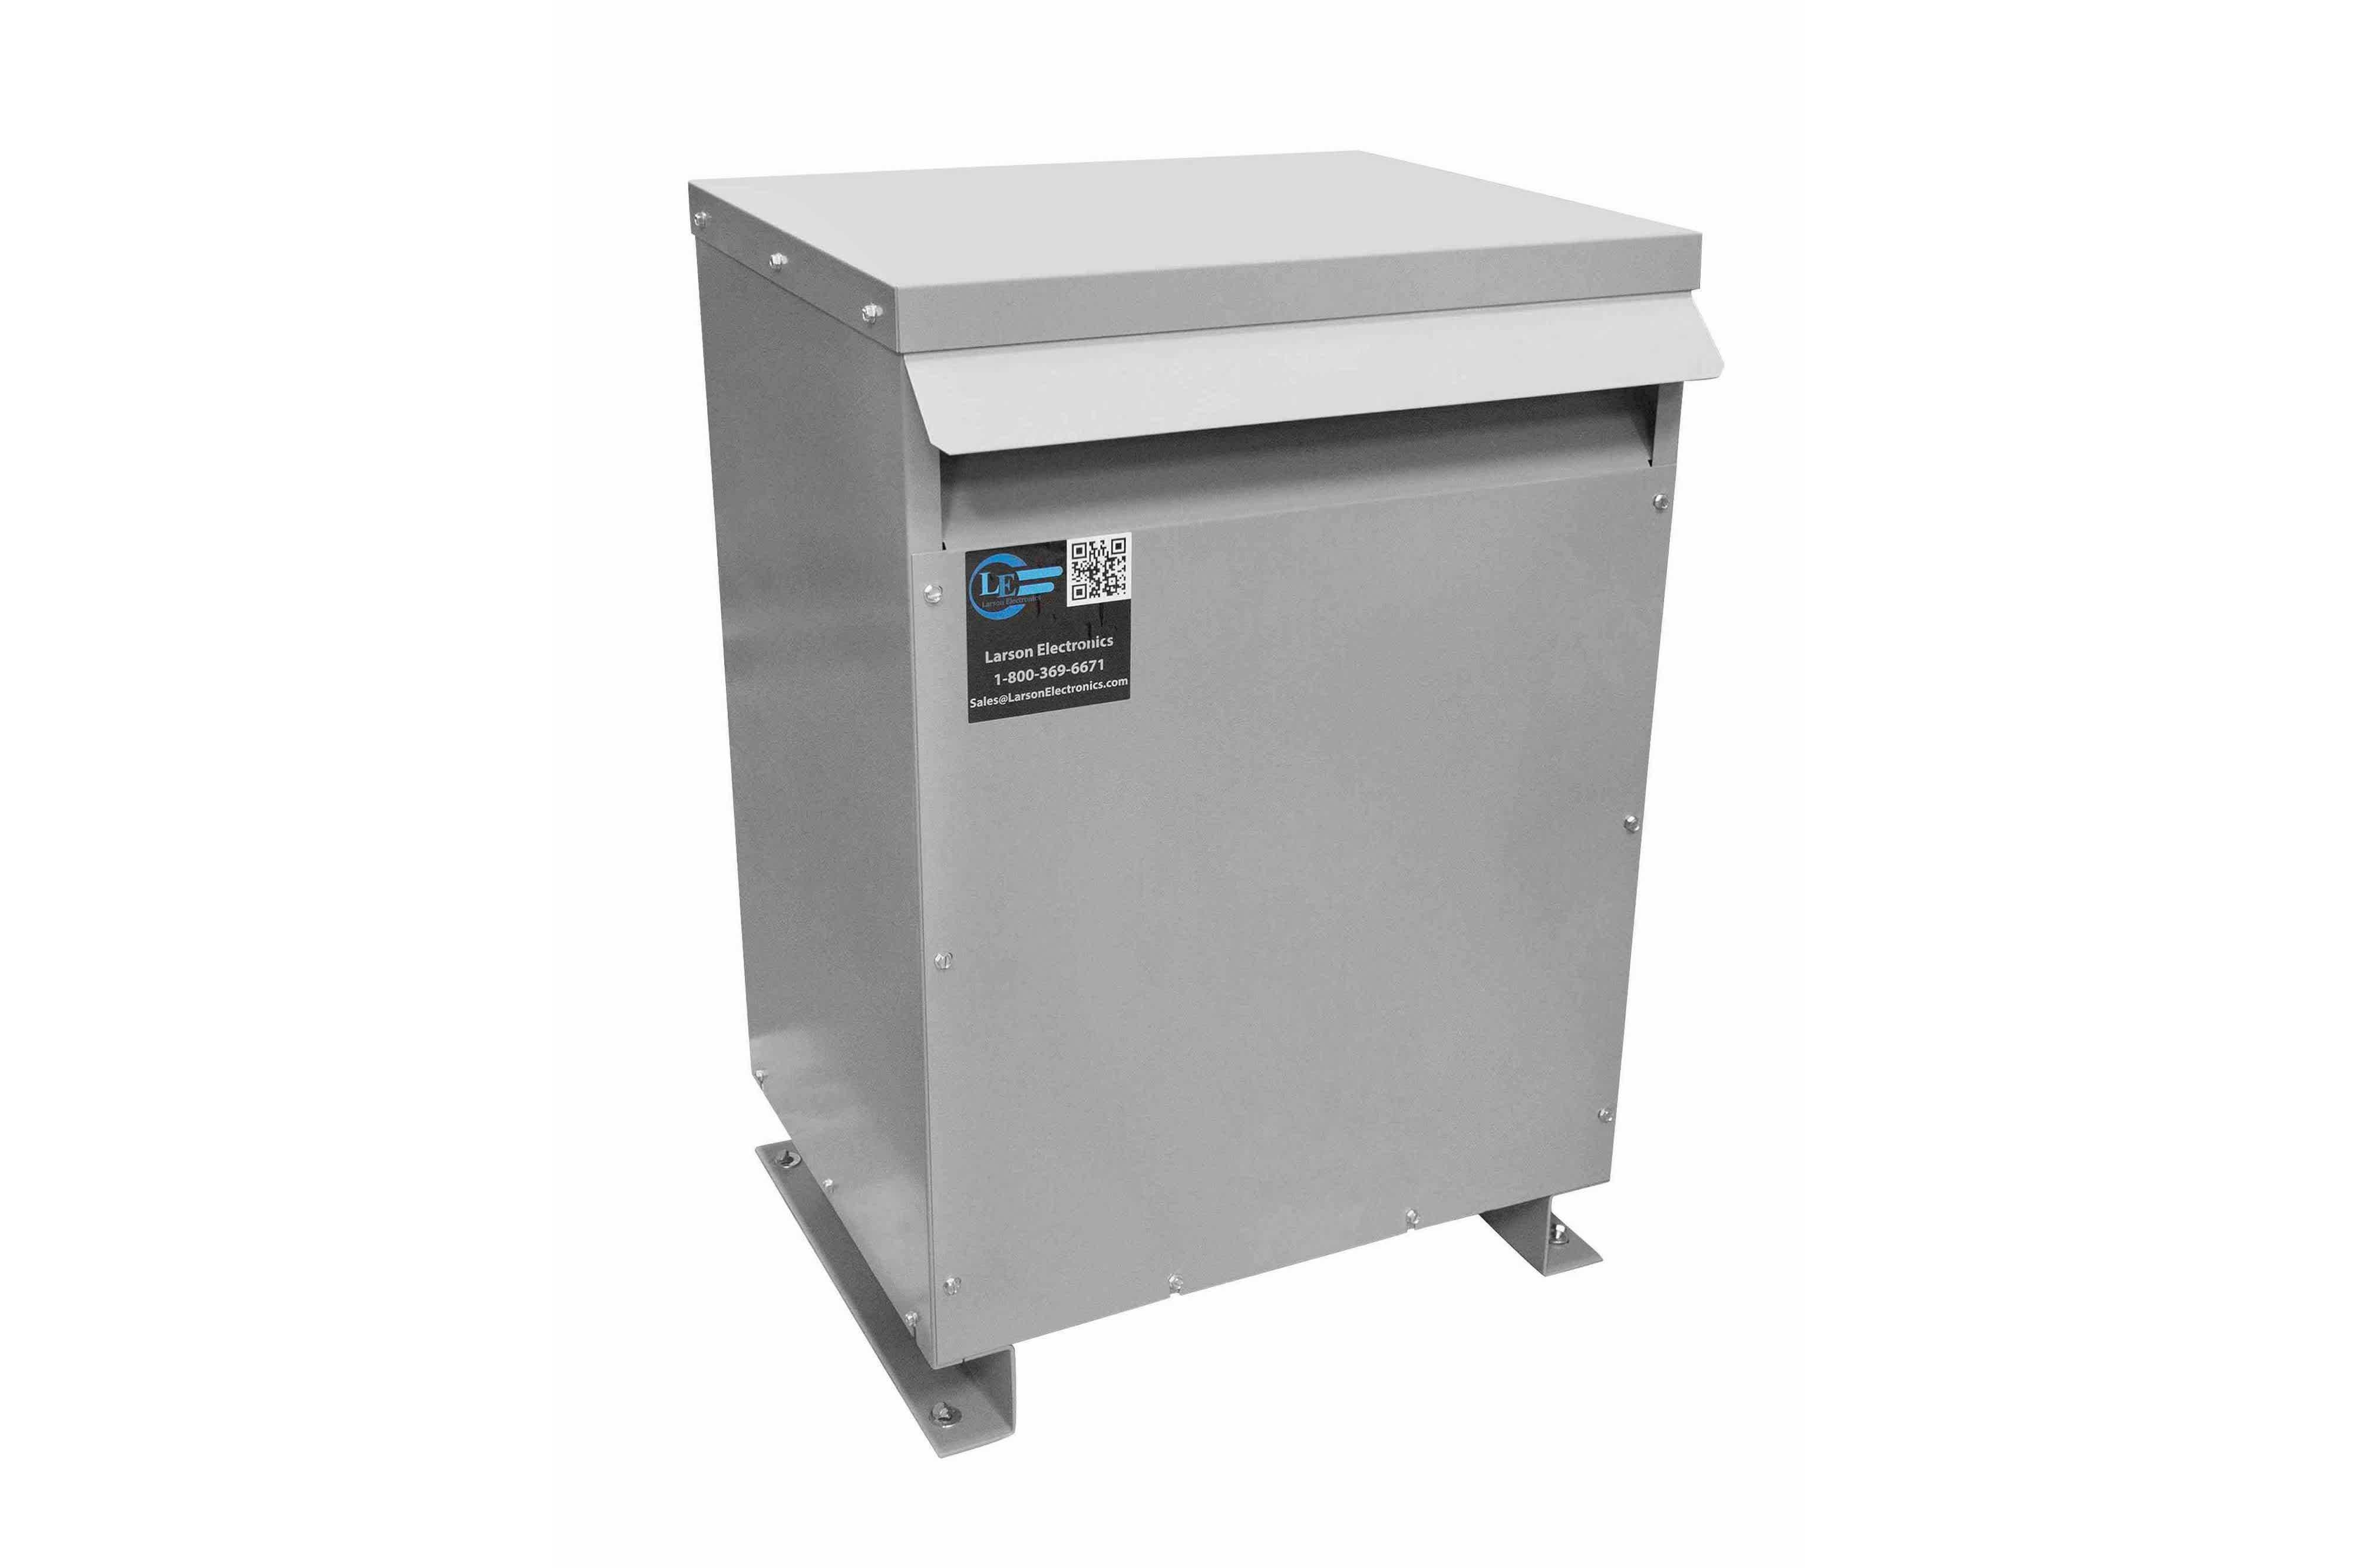 30 kVA 3PH Isolation Transformer, 600V Wye Primary, 240V Delta Secondary, N3R, Ventilated, 60 Hz